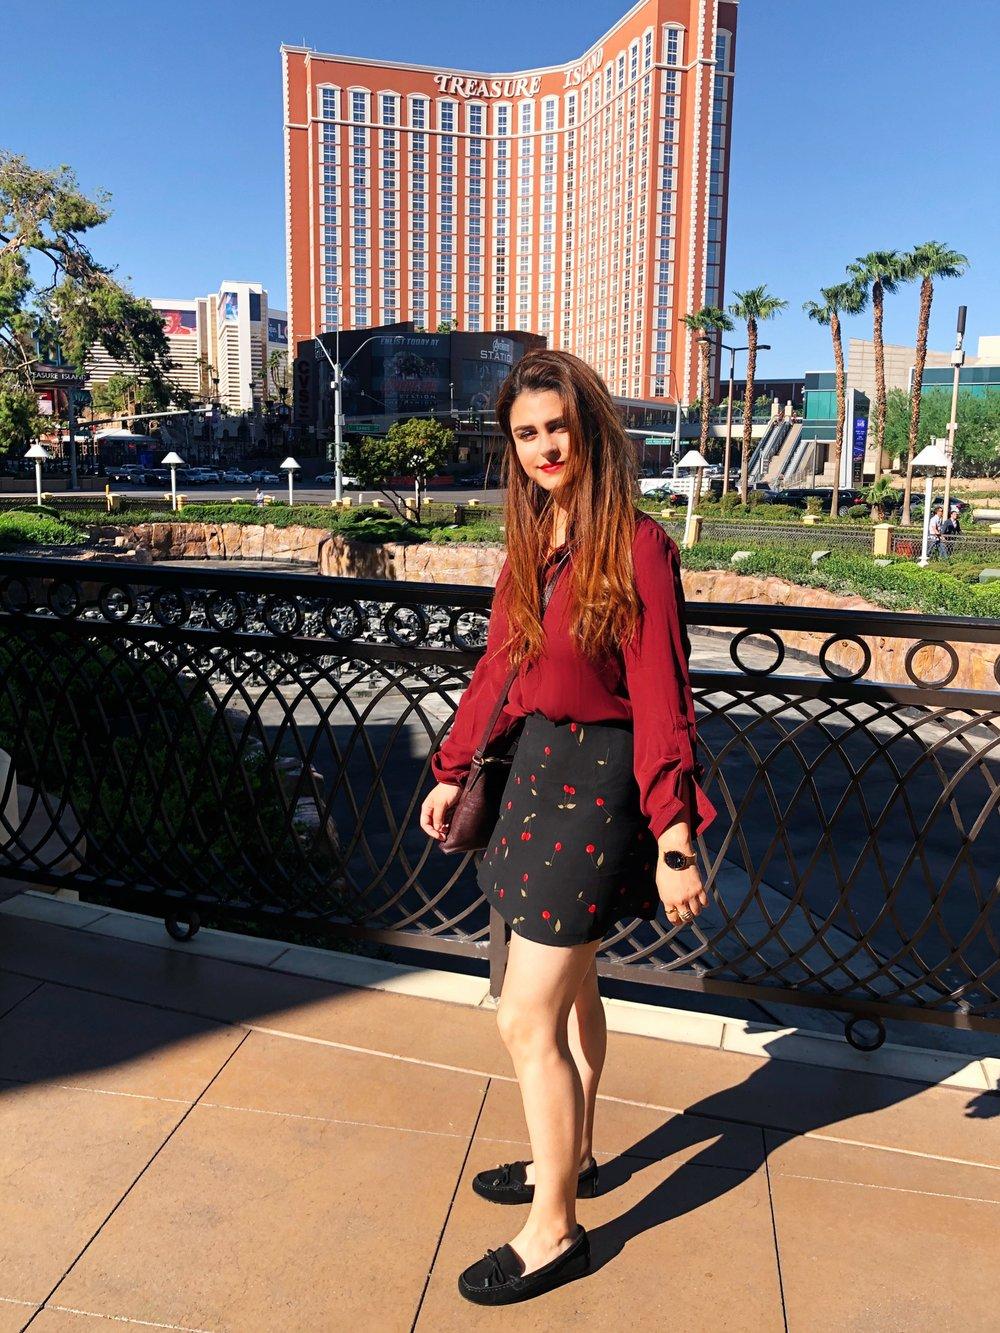 Blouse  -  Skirt  - Shoes  (similar)